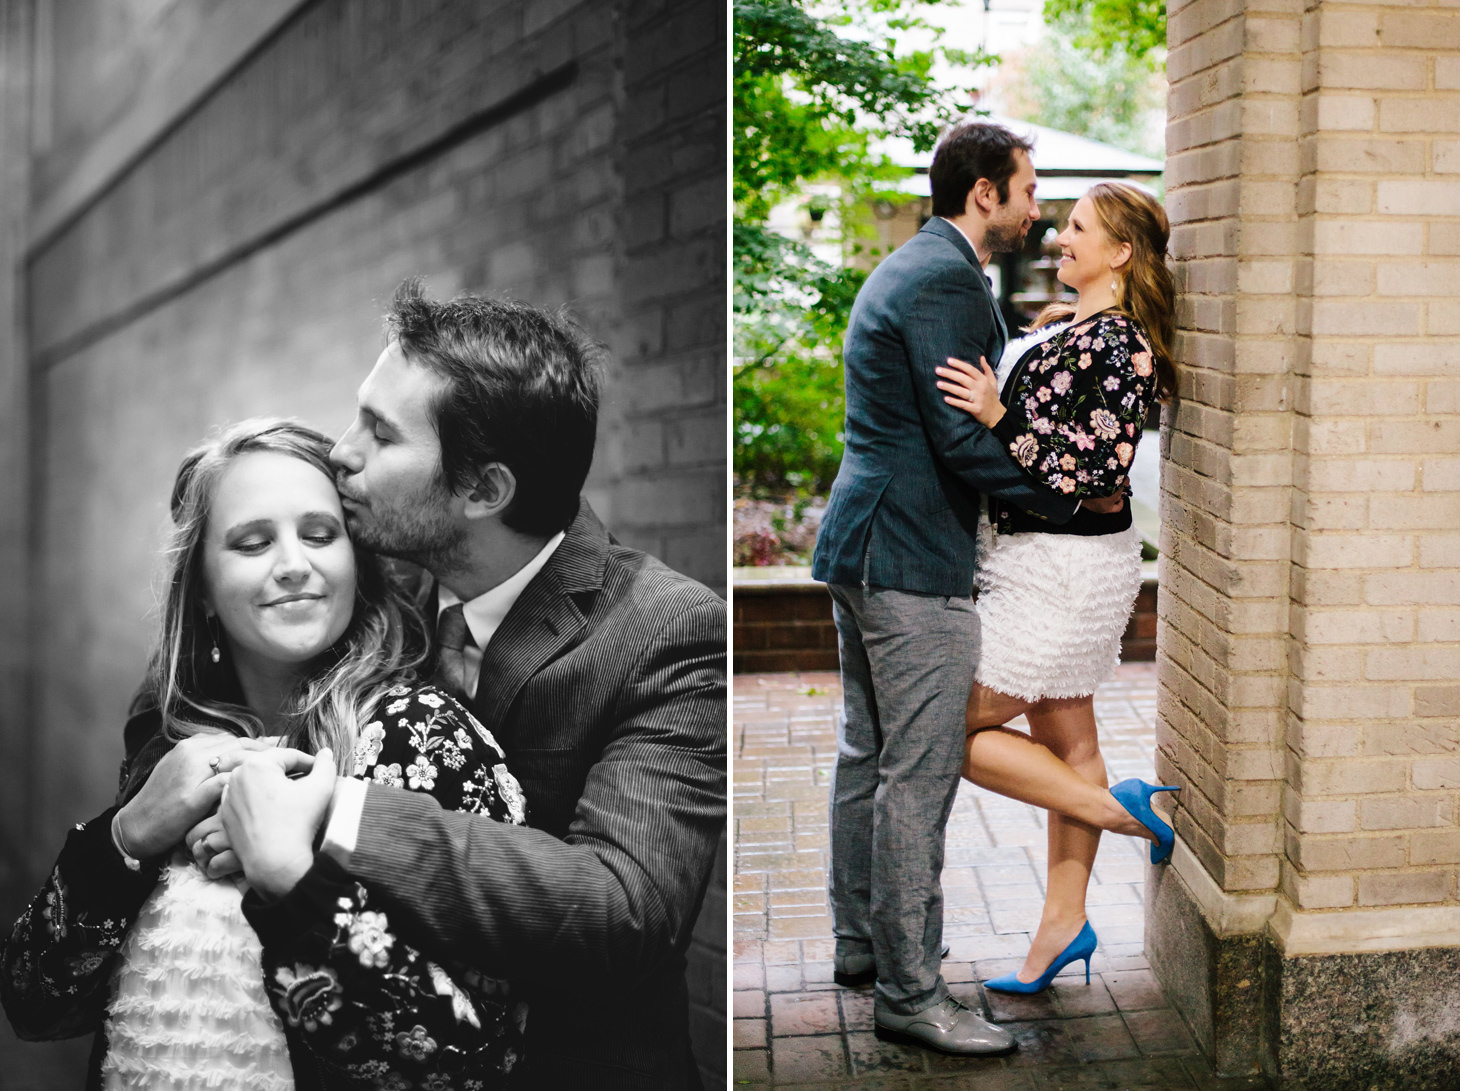 023-NYC-Intimate-Wedding-photography-SmittenChickens-city-hall-lauren-aaron.jpg